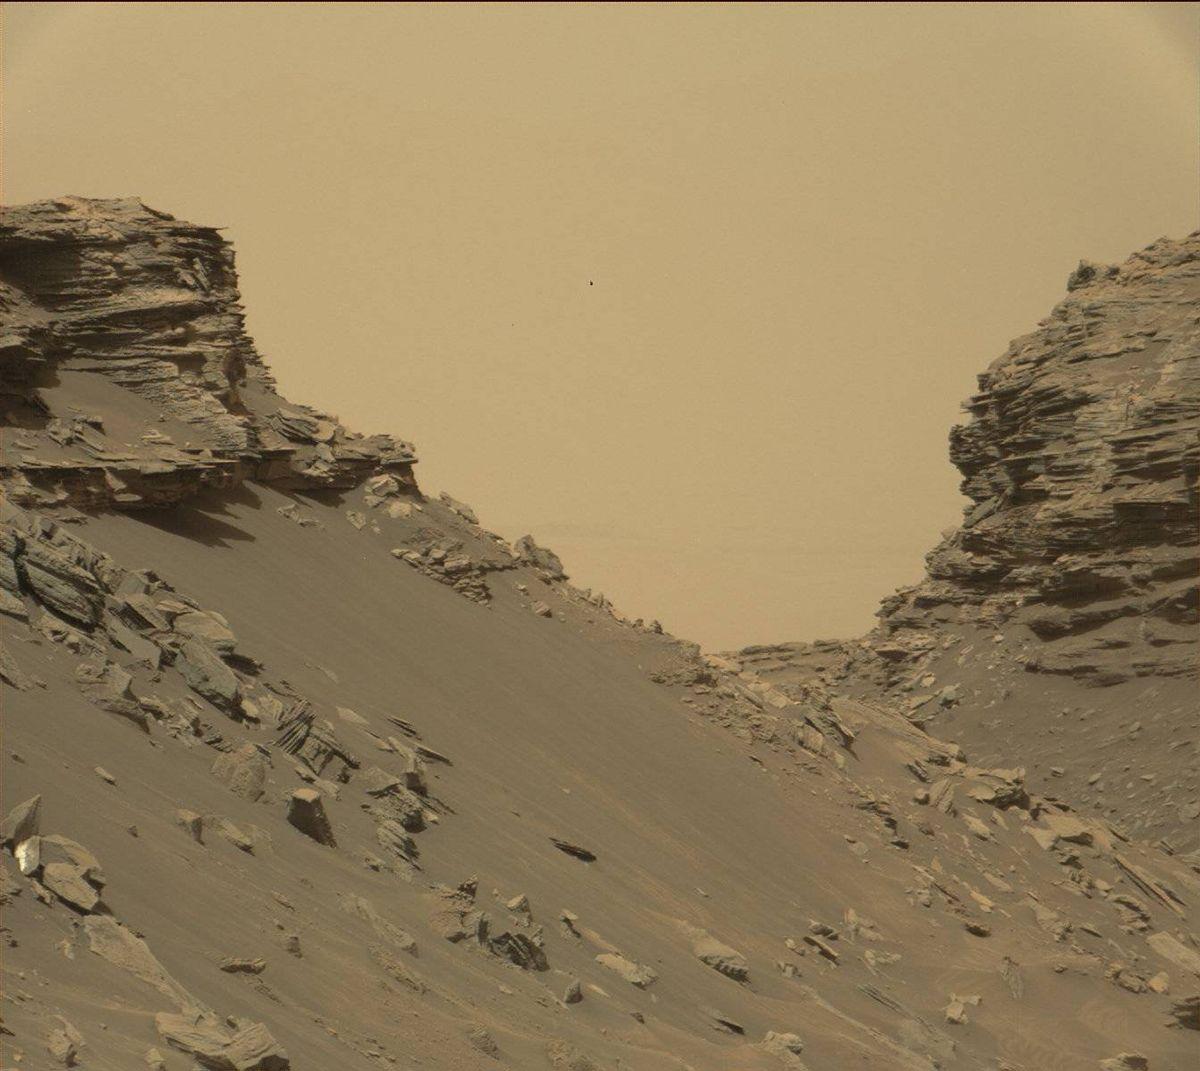 16 8020_mars-curiosity-rover-msl-rock-layers-PIA21042-full2NASA Mars Rover